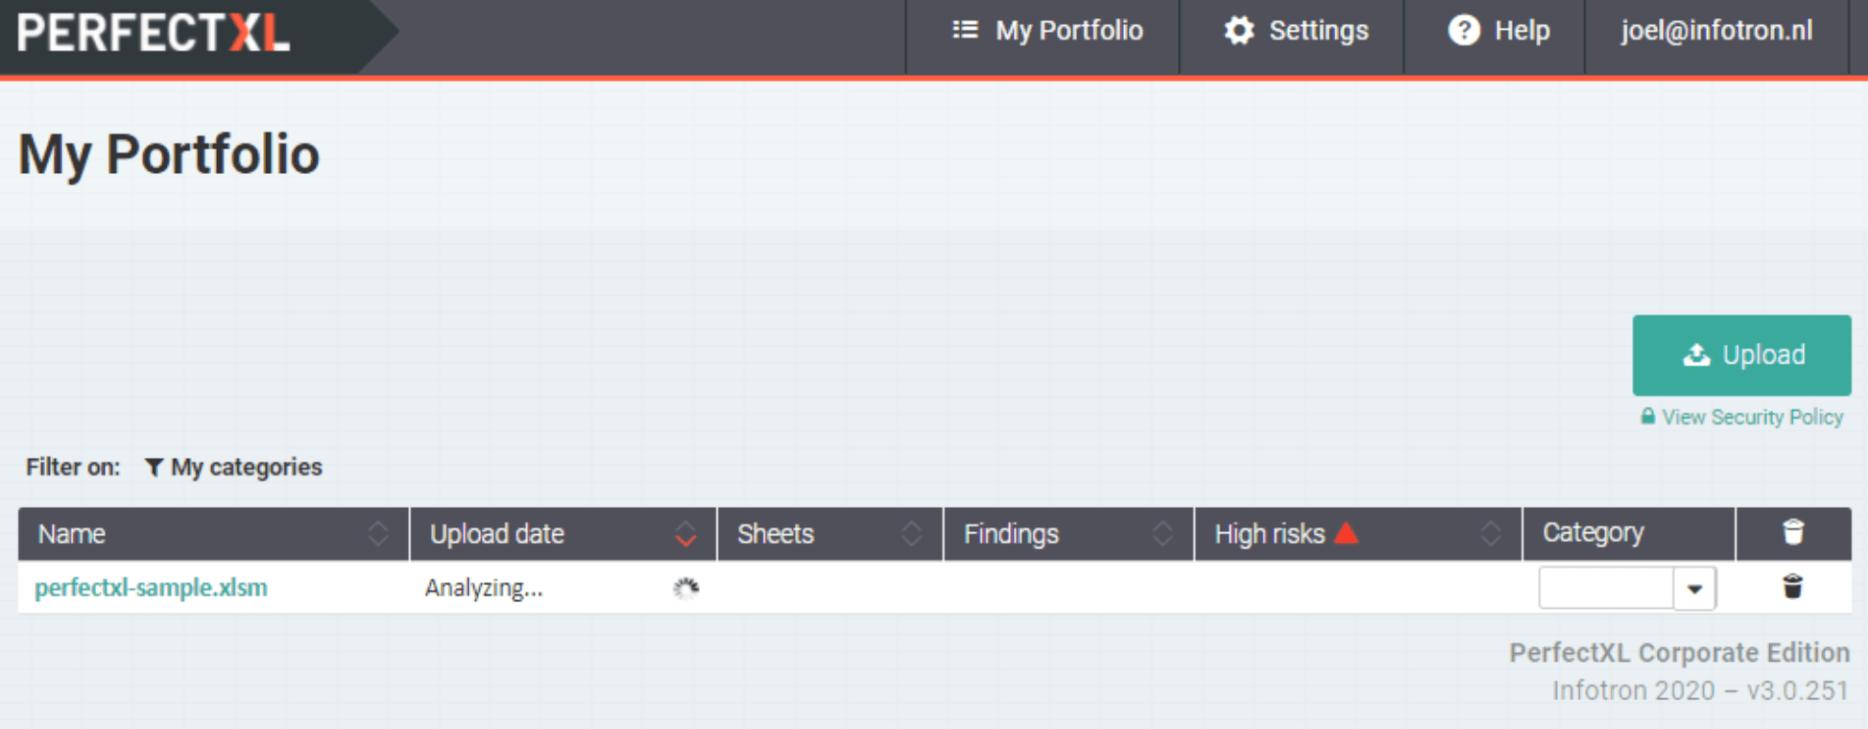 PerfectXL Risk Eliminator walkthrough // Spreadsheet portfolio